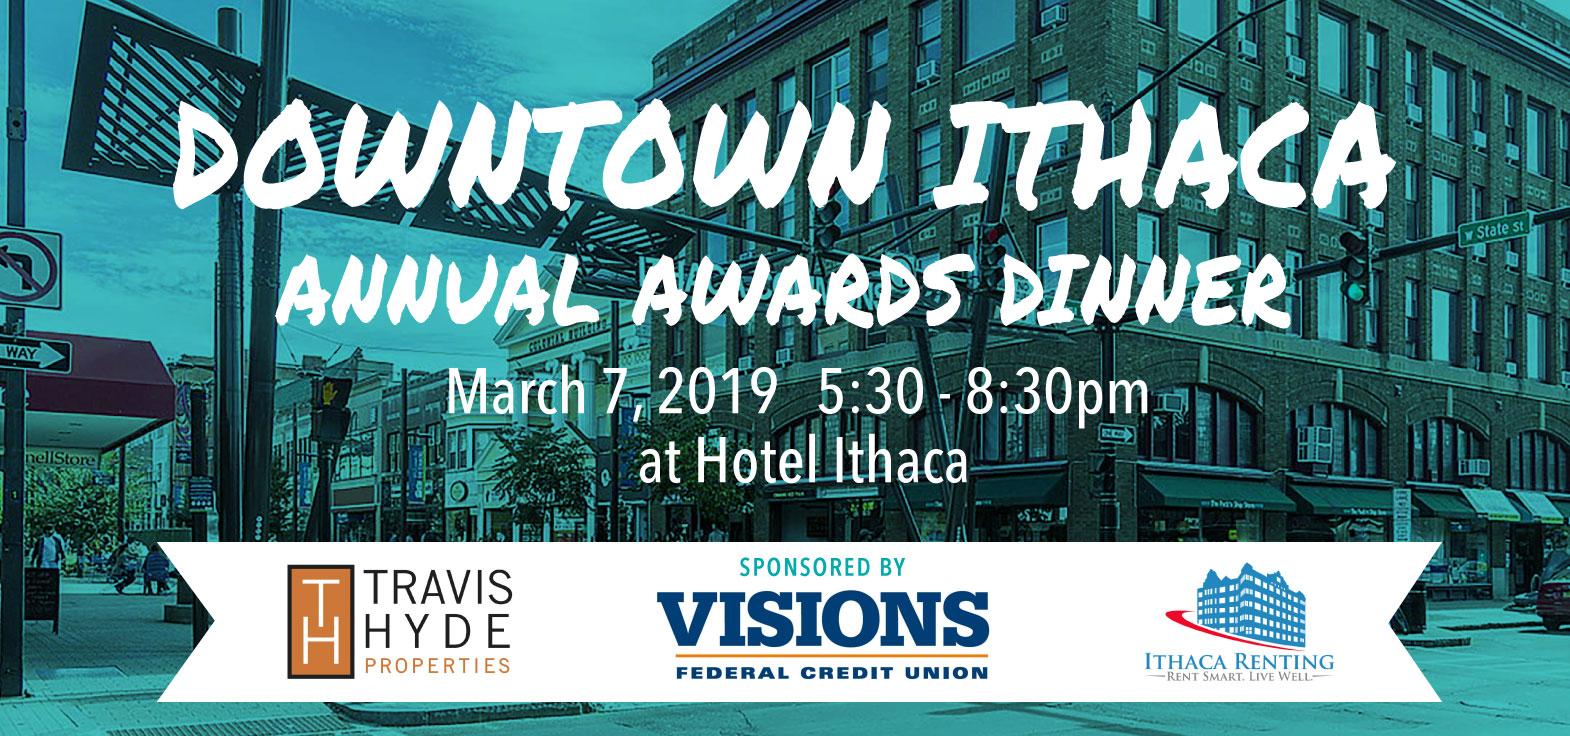 Annual Awards Dinner 2019 Image